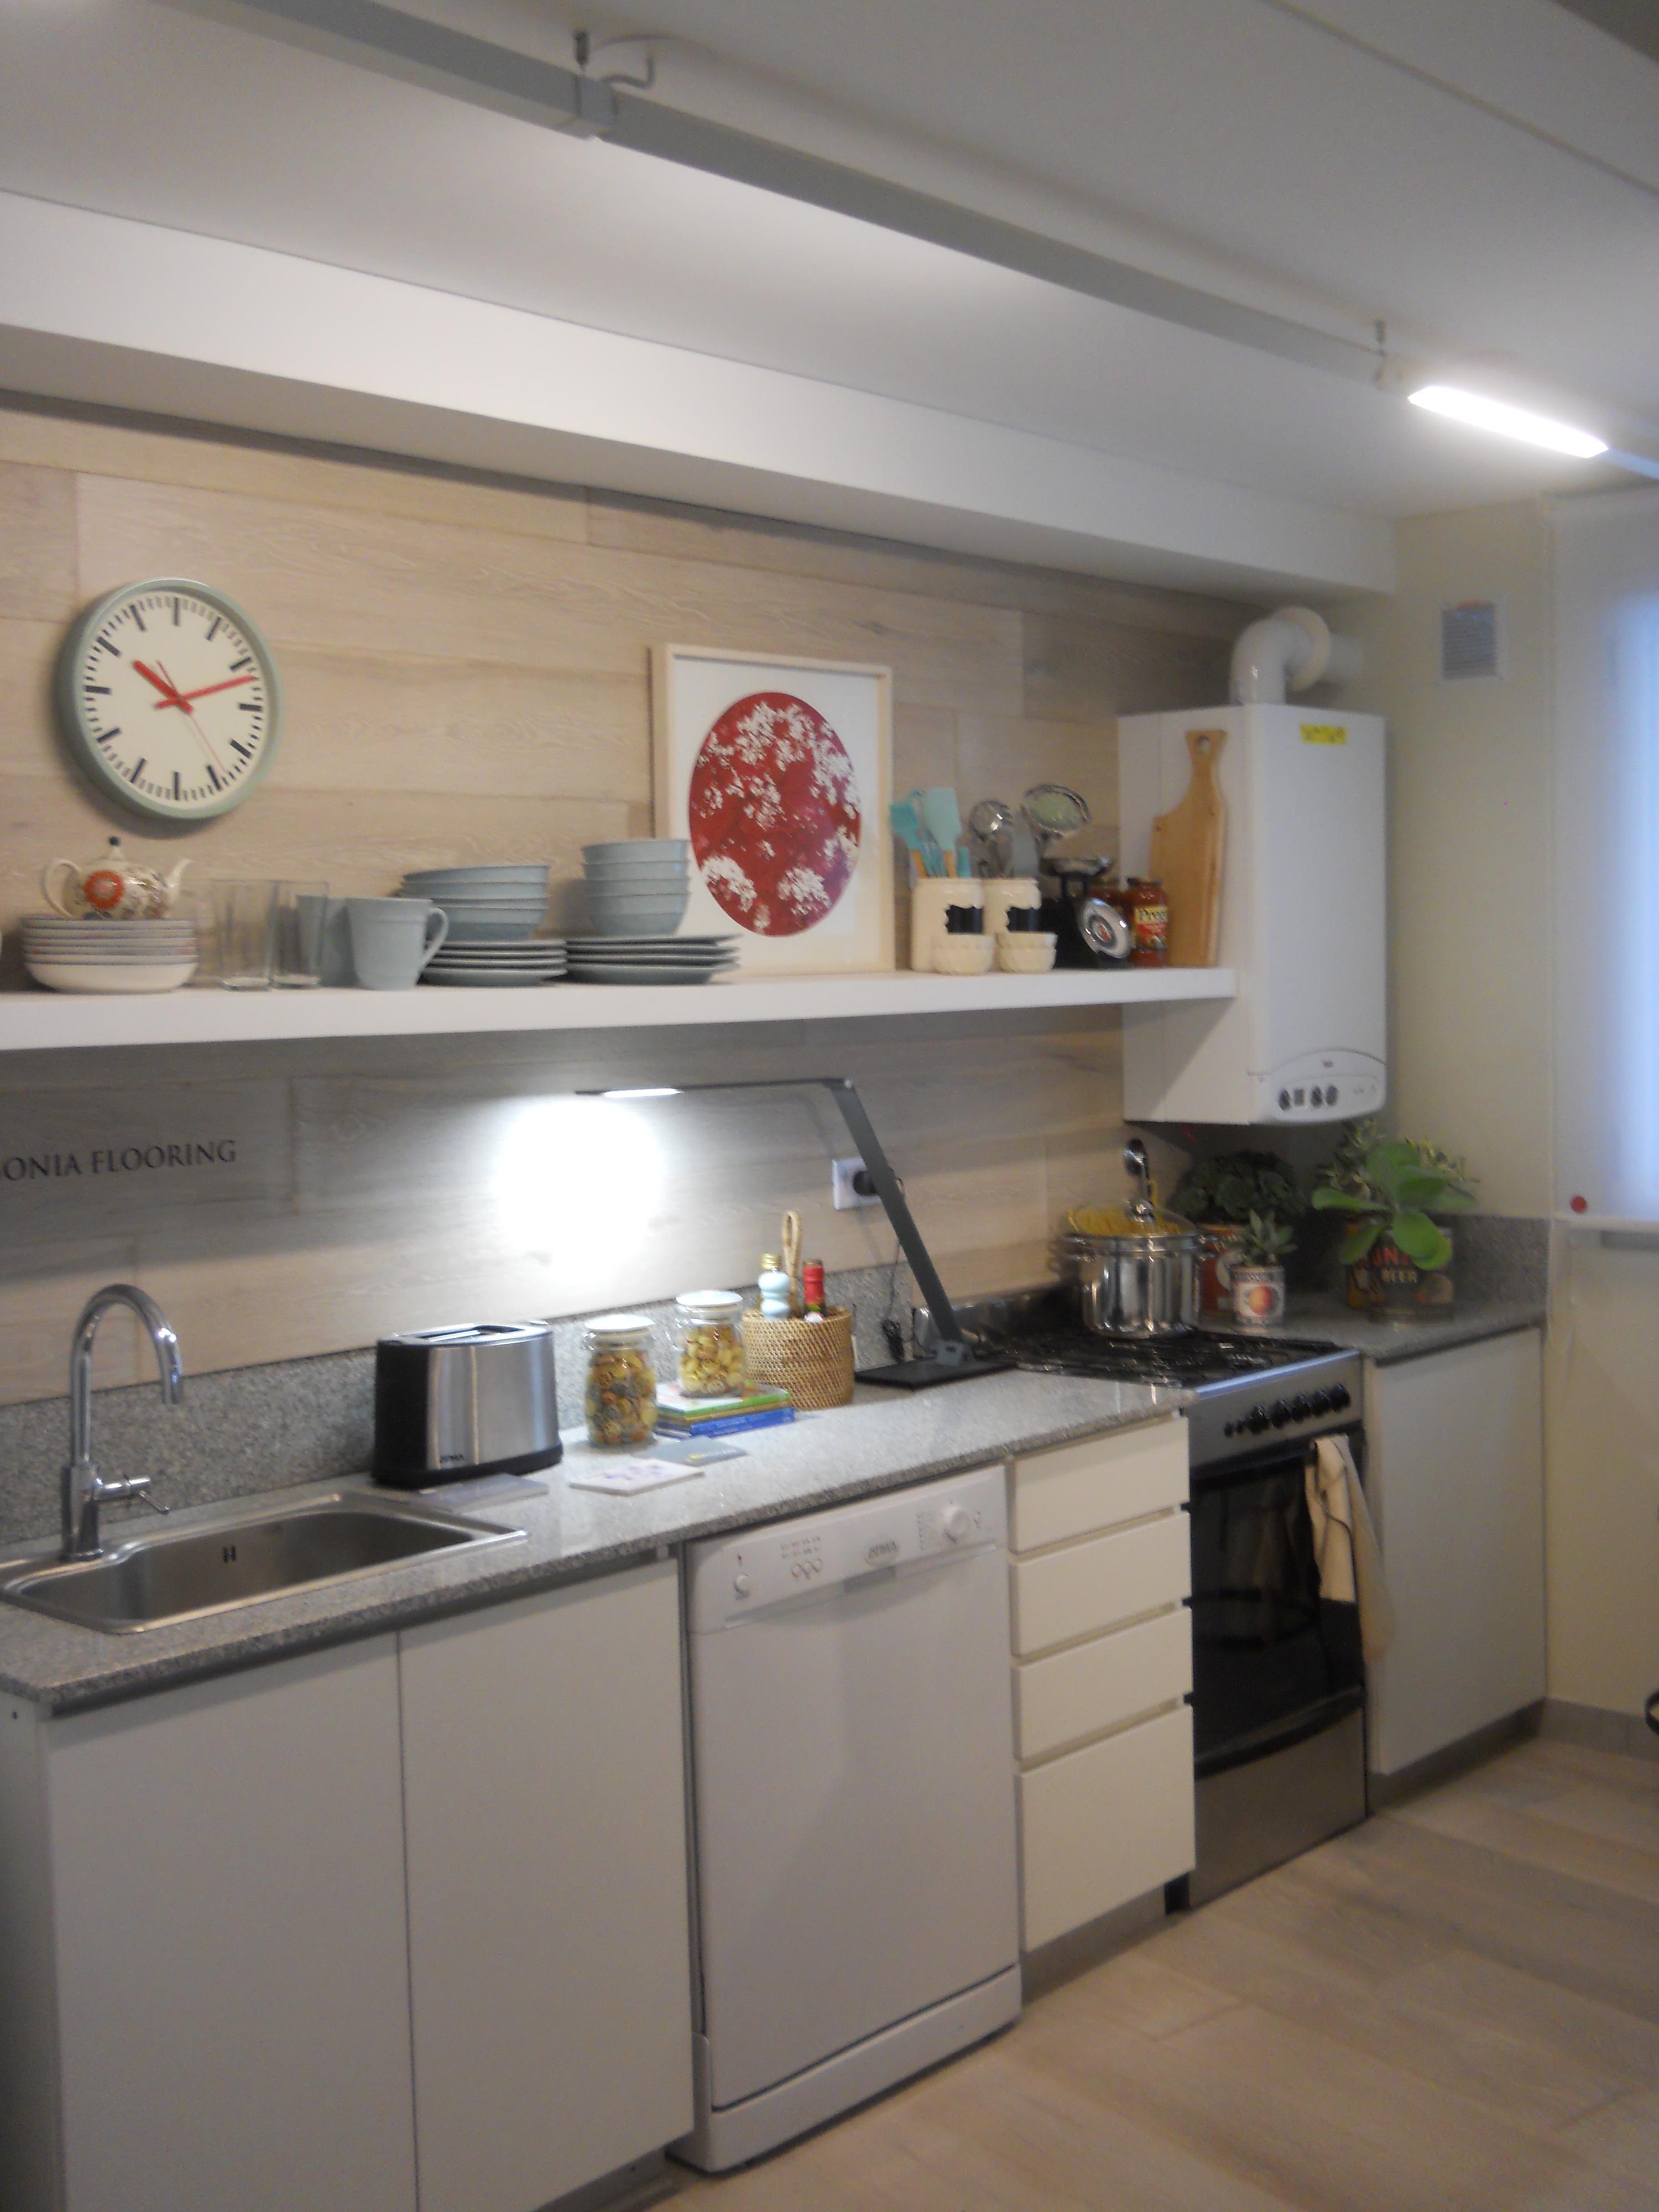 Iluminacion para cocina cocina moderna muy elegante con muebles e isla de color negro cocina - Iluminacion para muebles ...